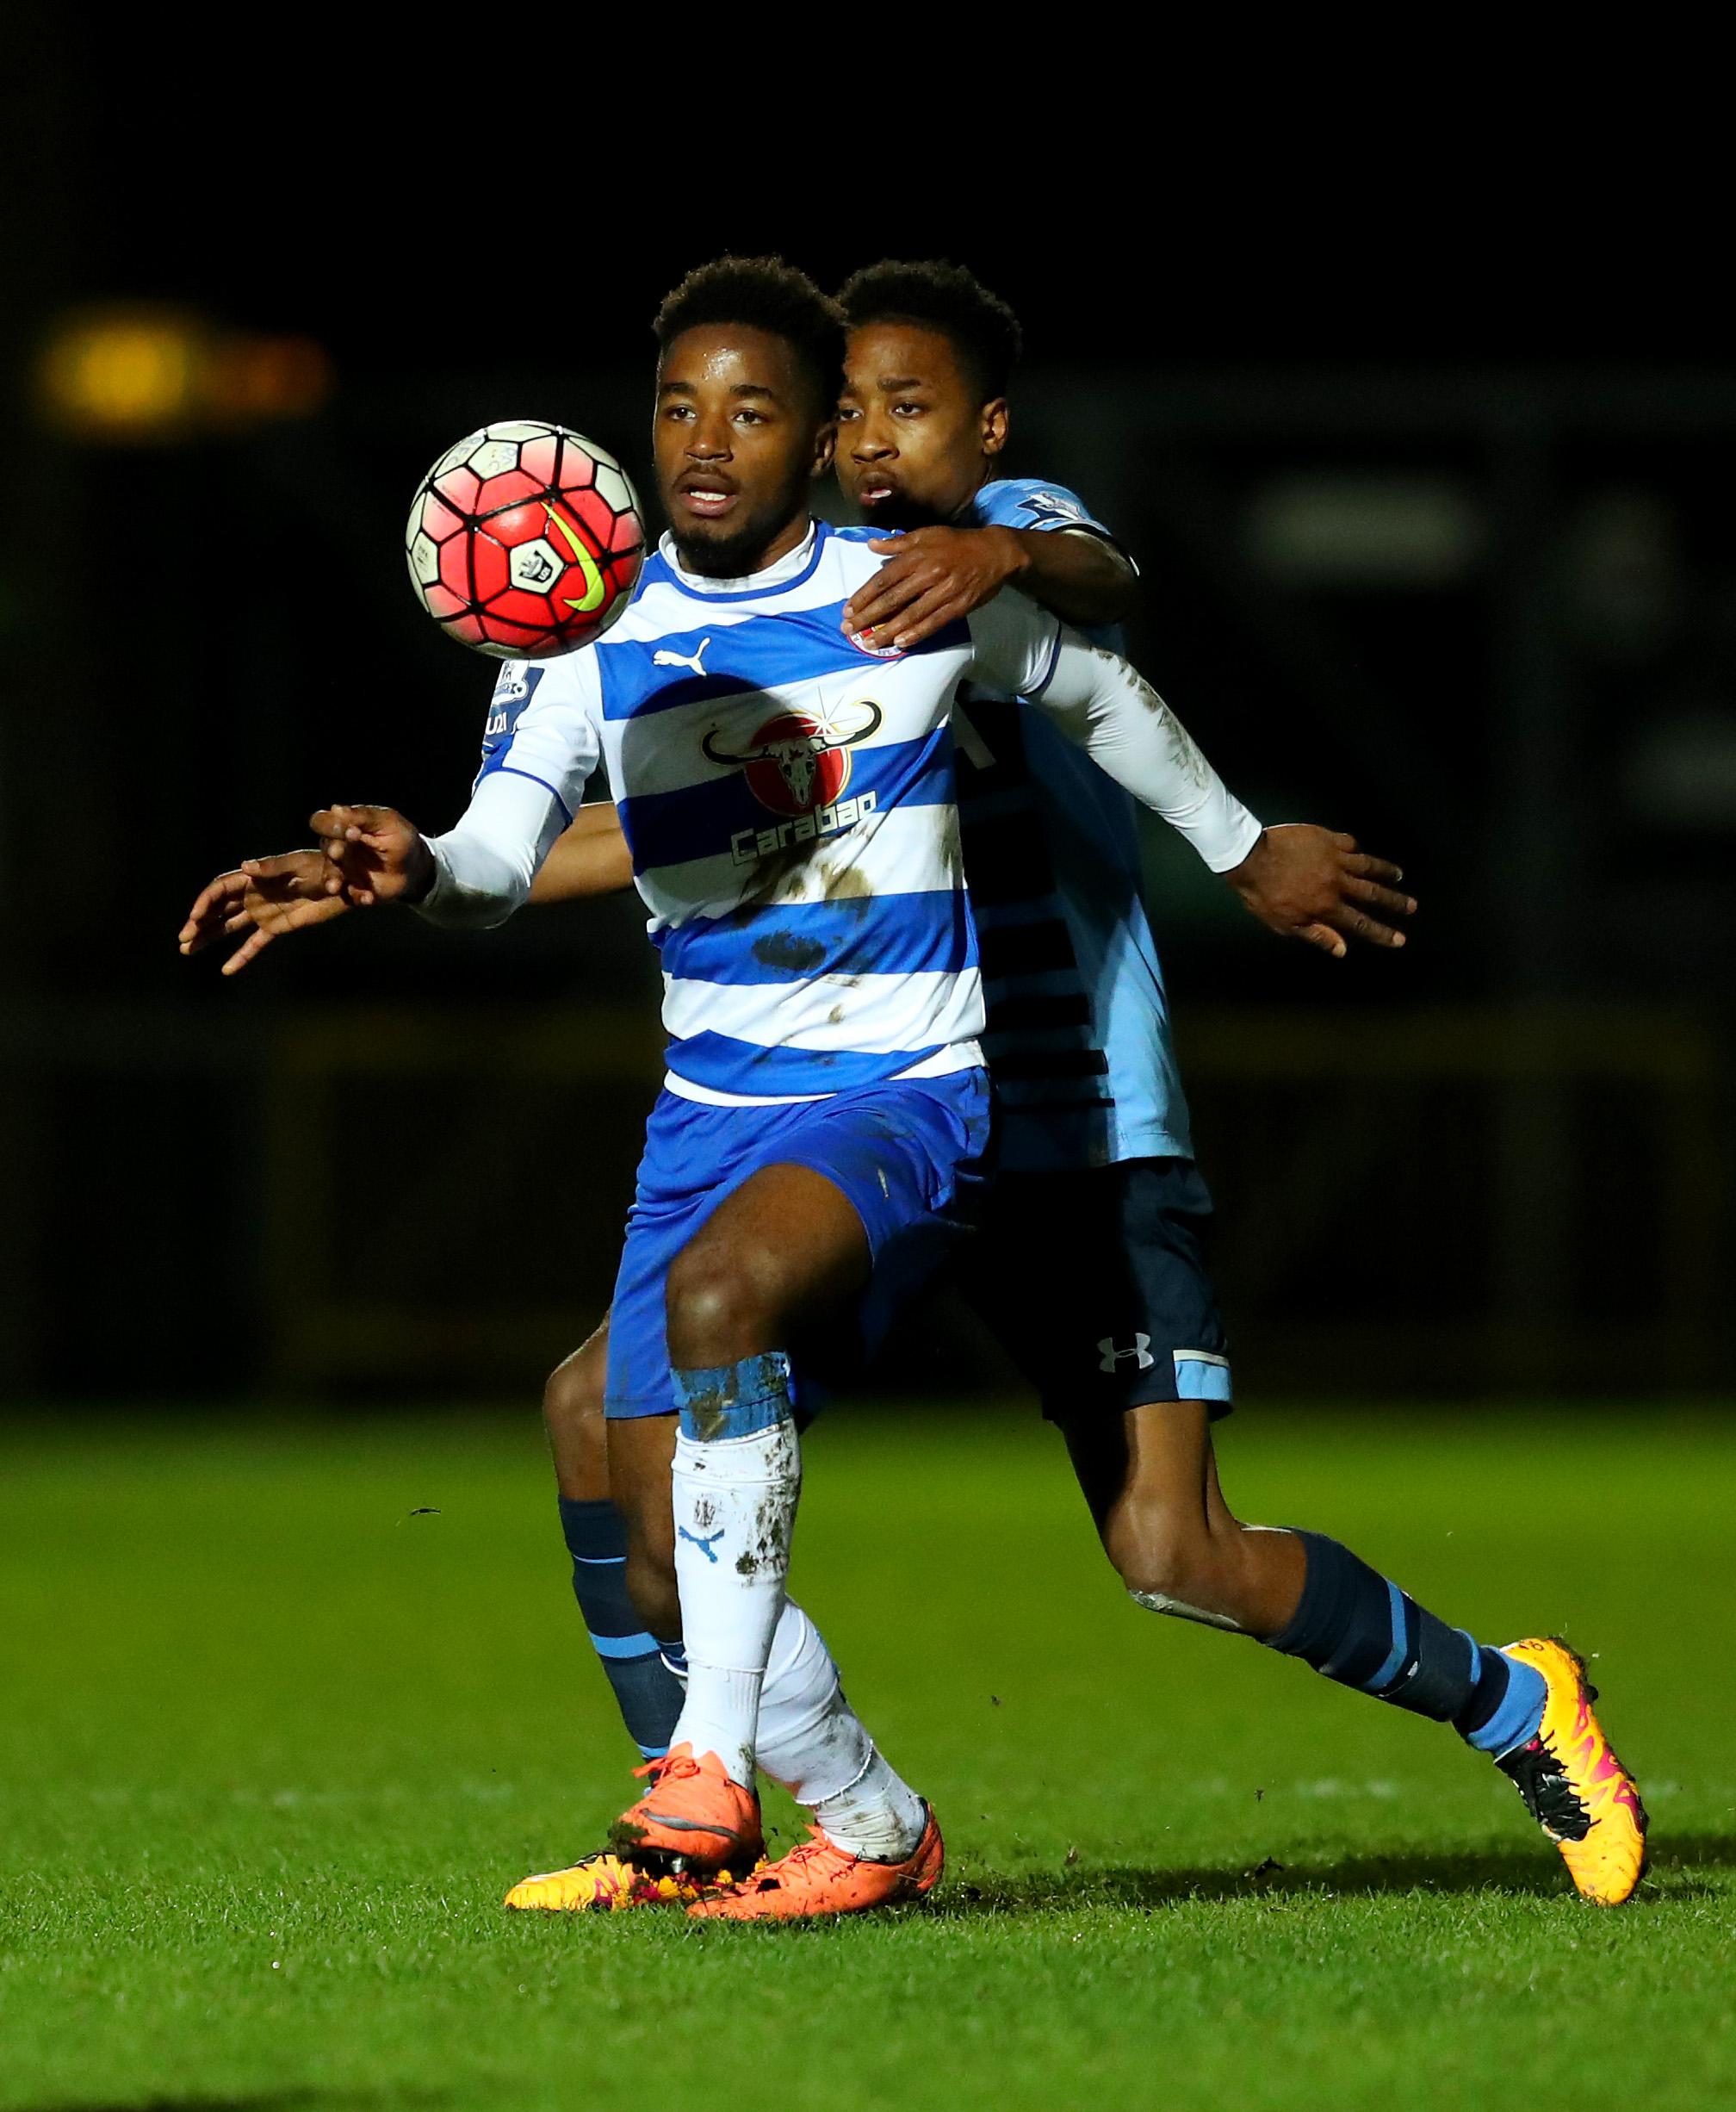 Reading U21 v Tottenham Hotspur U21: Barclays U21 Premier League